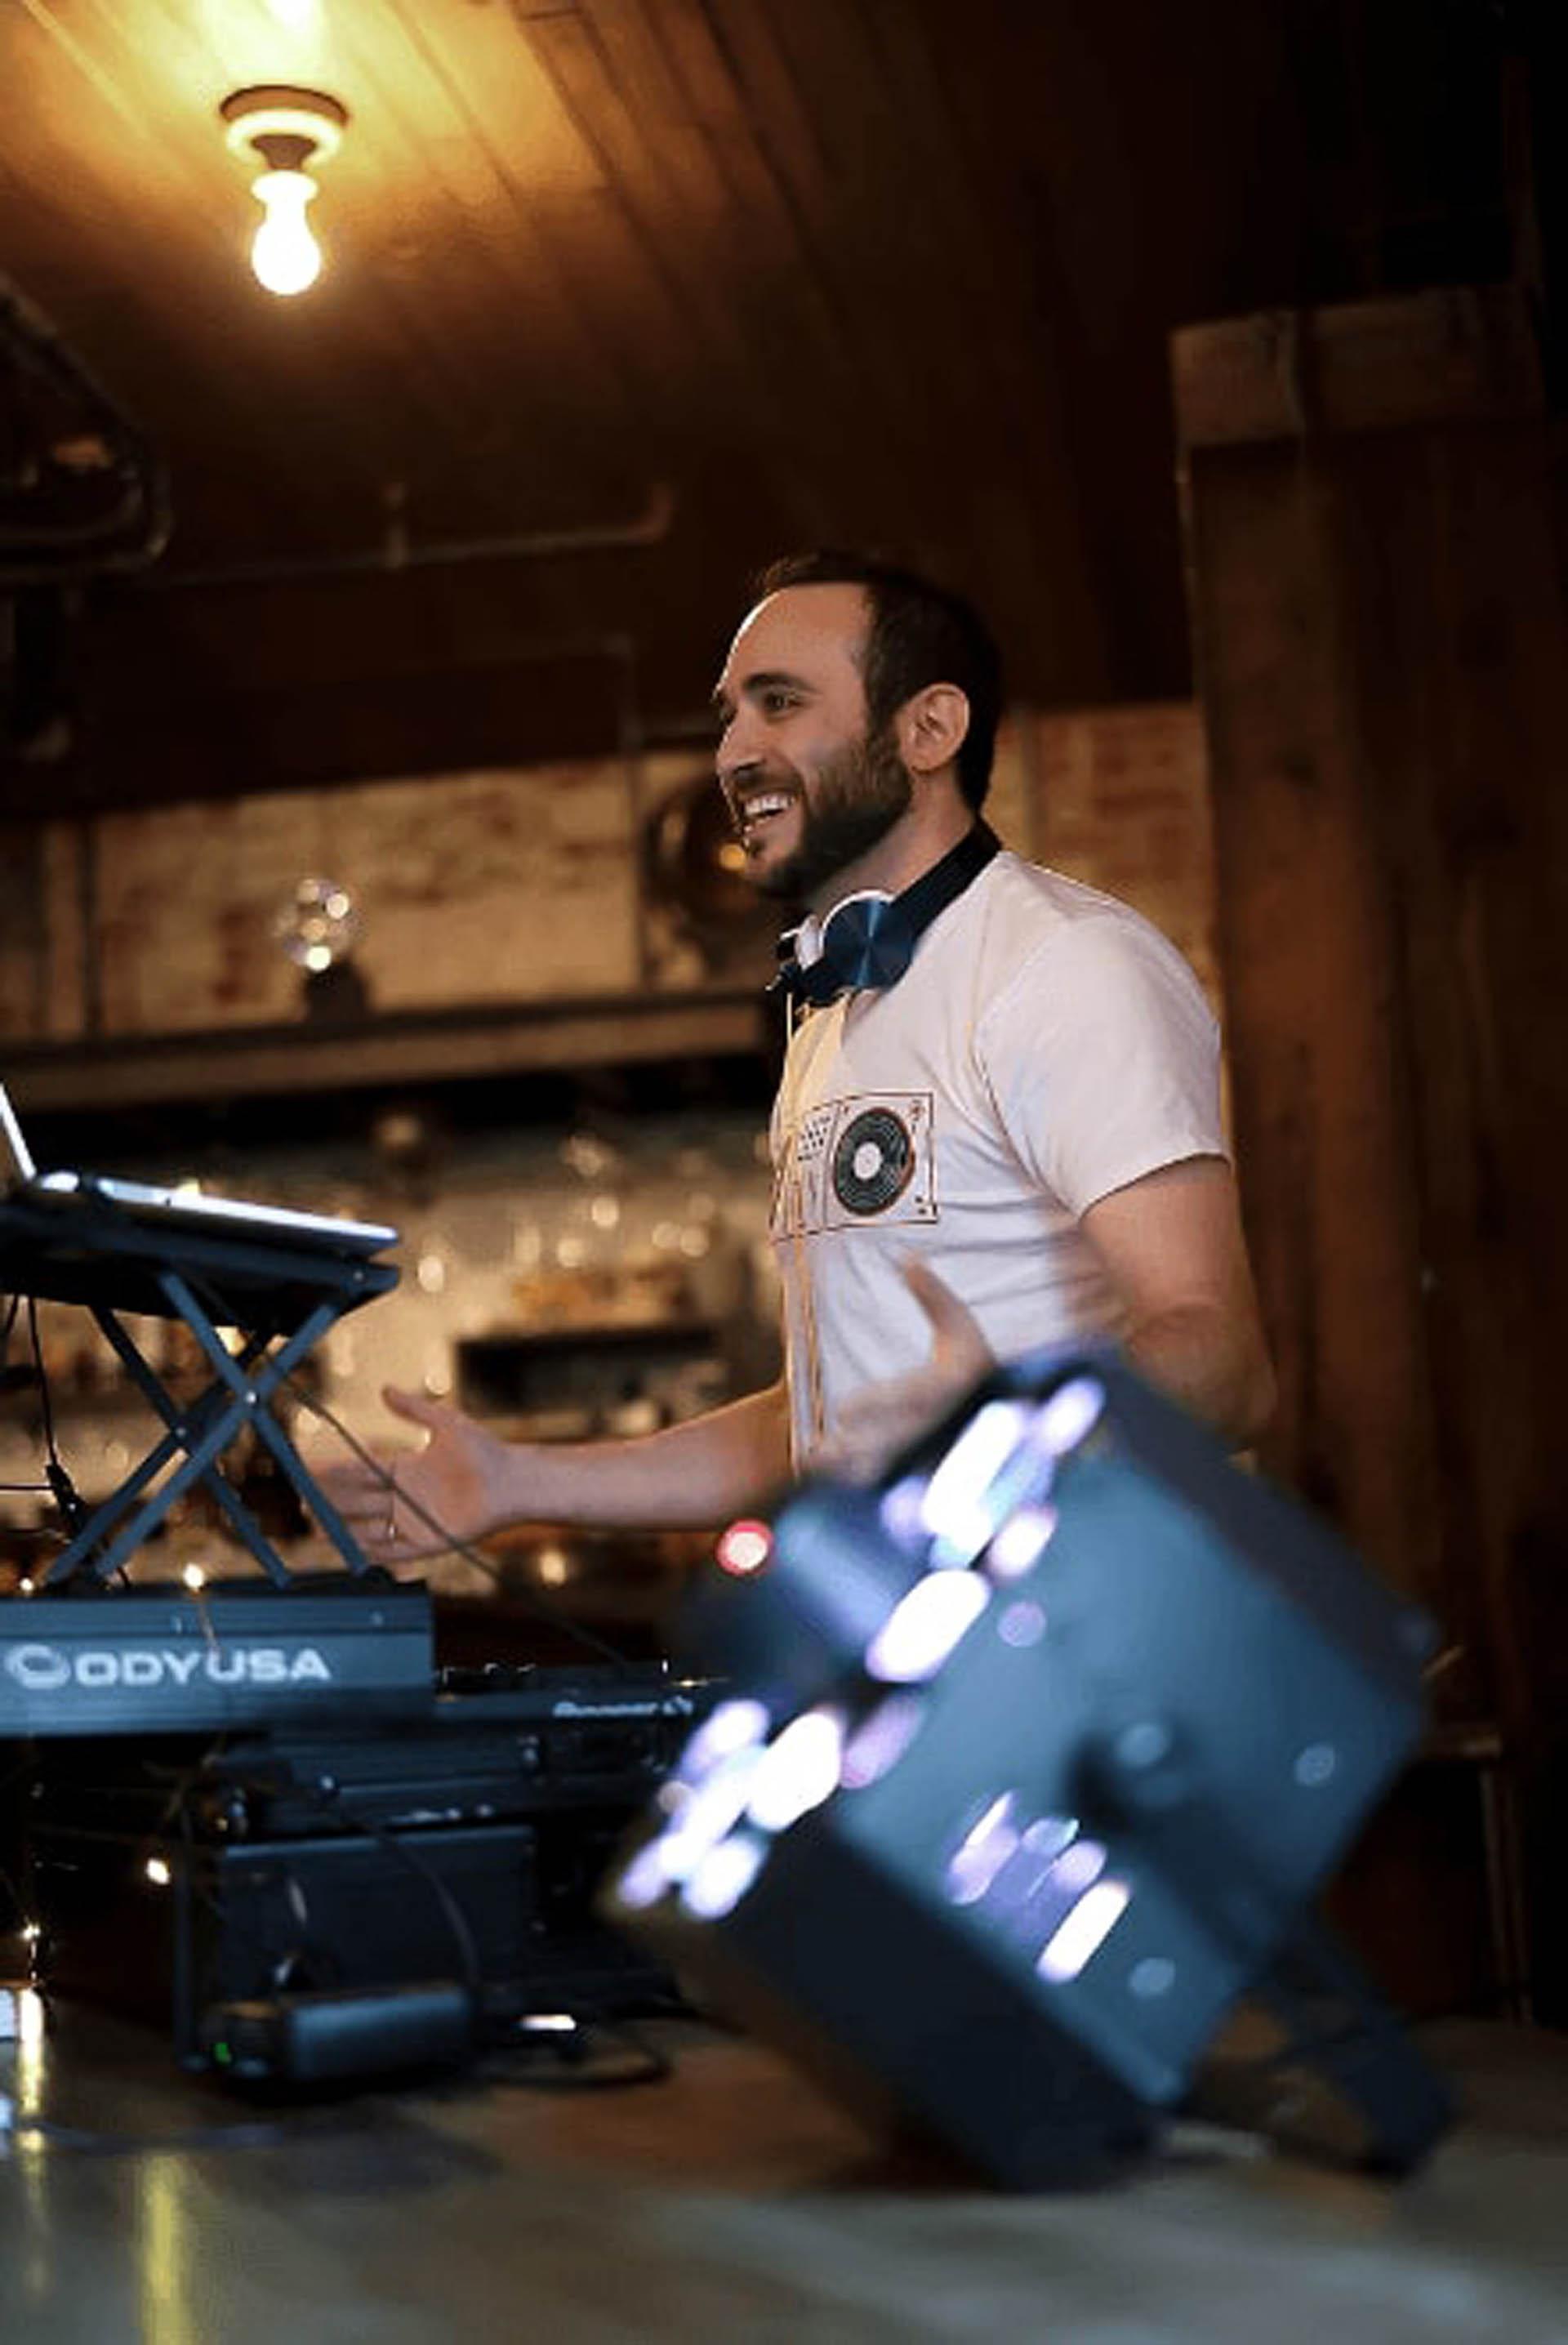 DJ Michael Demby smiling compressor.jpg